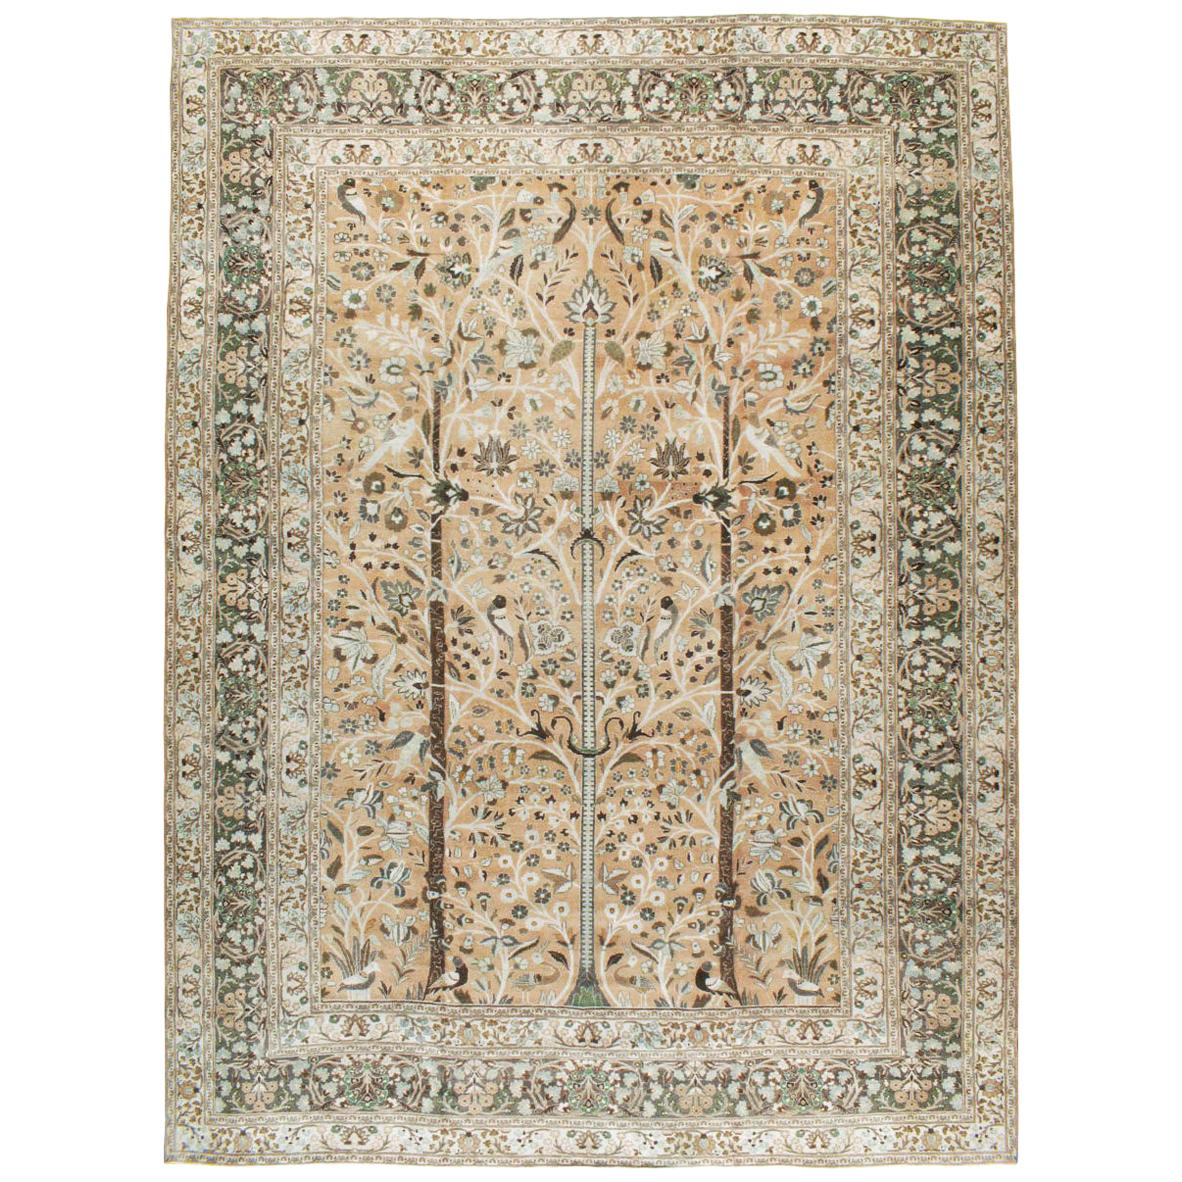 Mid-20th Century Handmade Persian Tree of Life Mashad Large Room Size Carpet